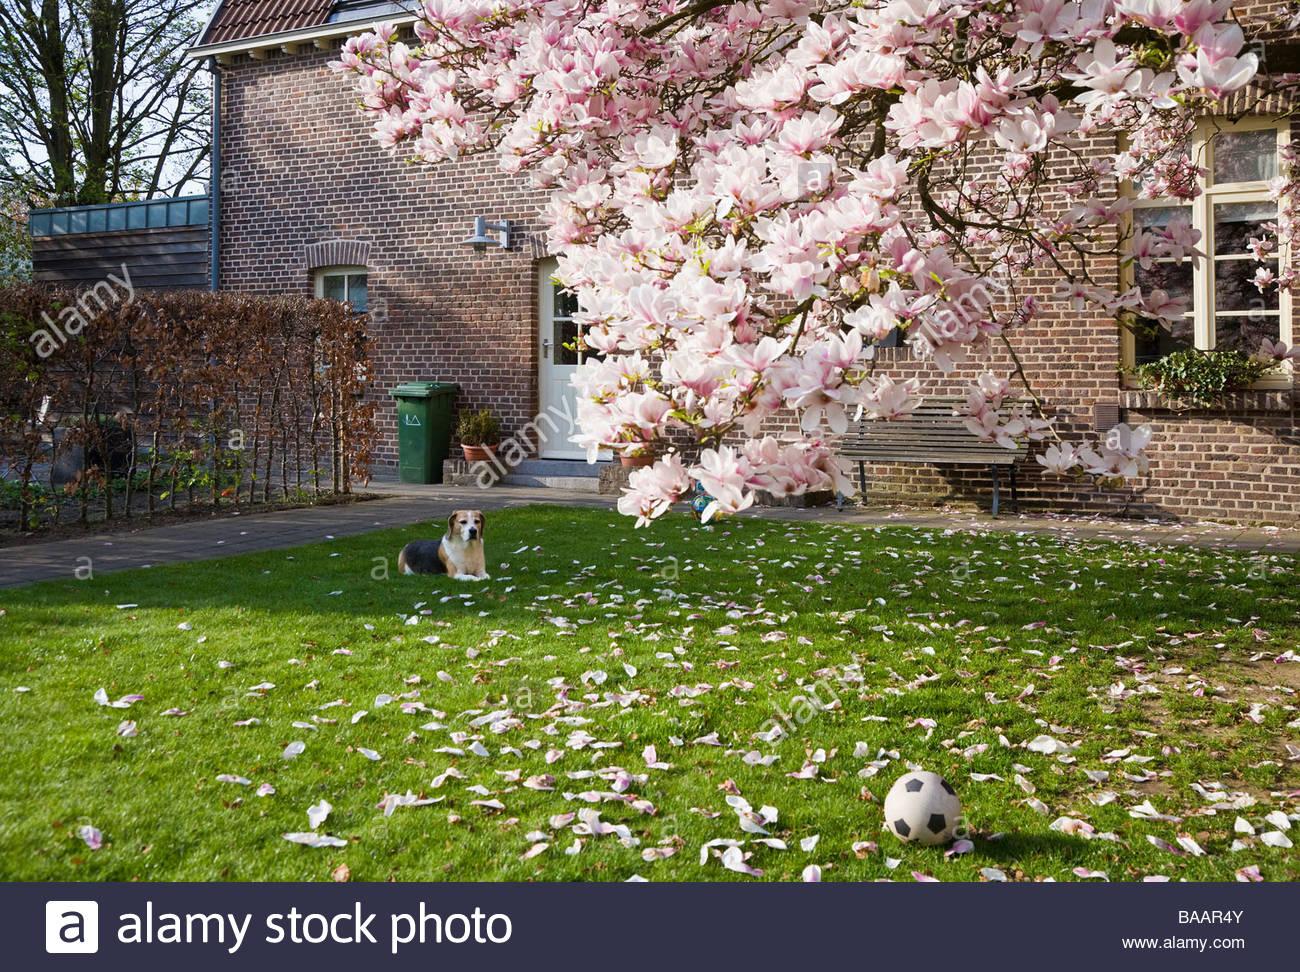 Flowering Magnolia Tree Lawn Dog Ball Small Garden Flower Petals